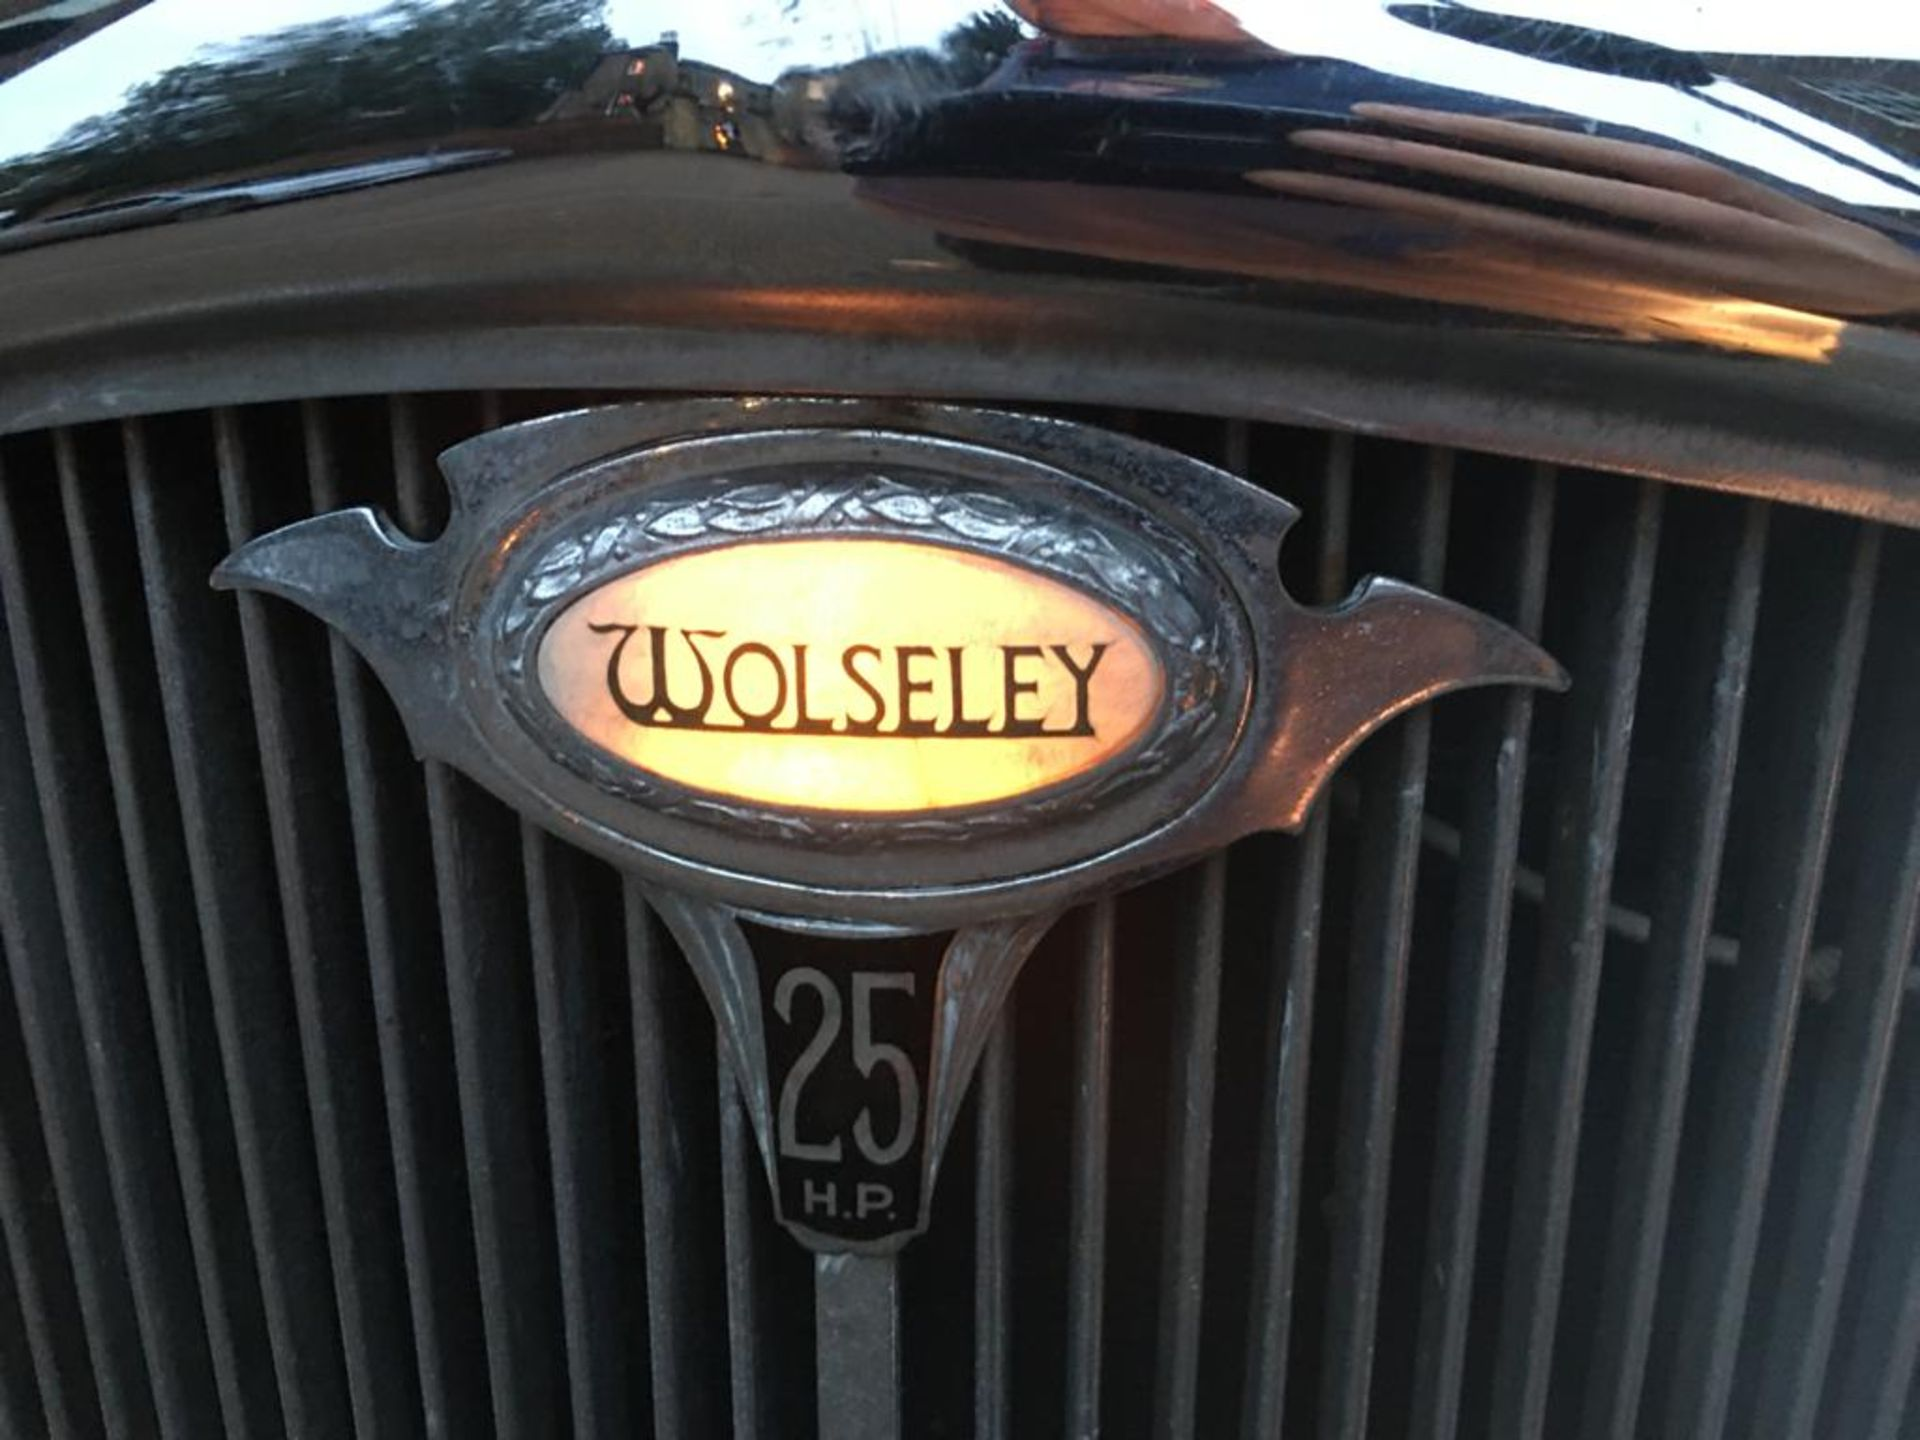 1938 WOLSELEY 25 CLASSIC 4.0 - Image 18 of 35